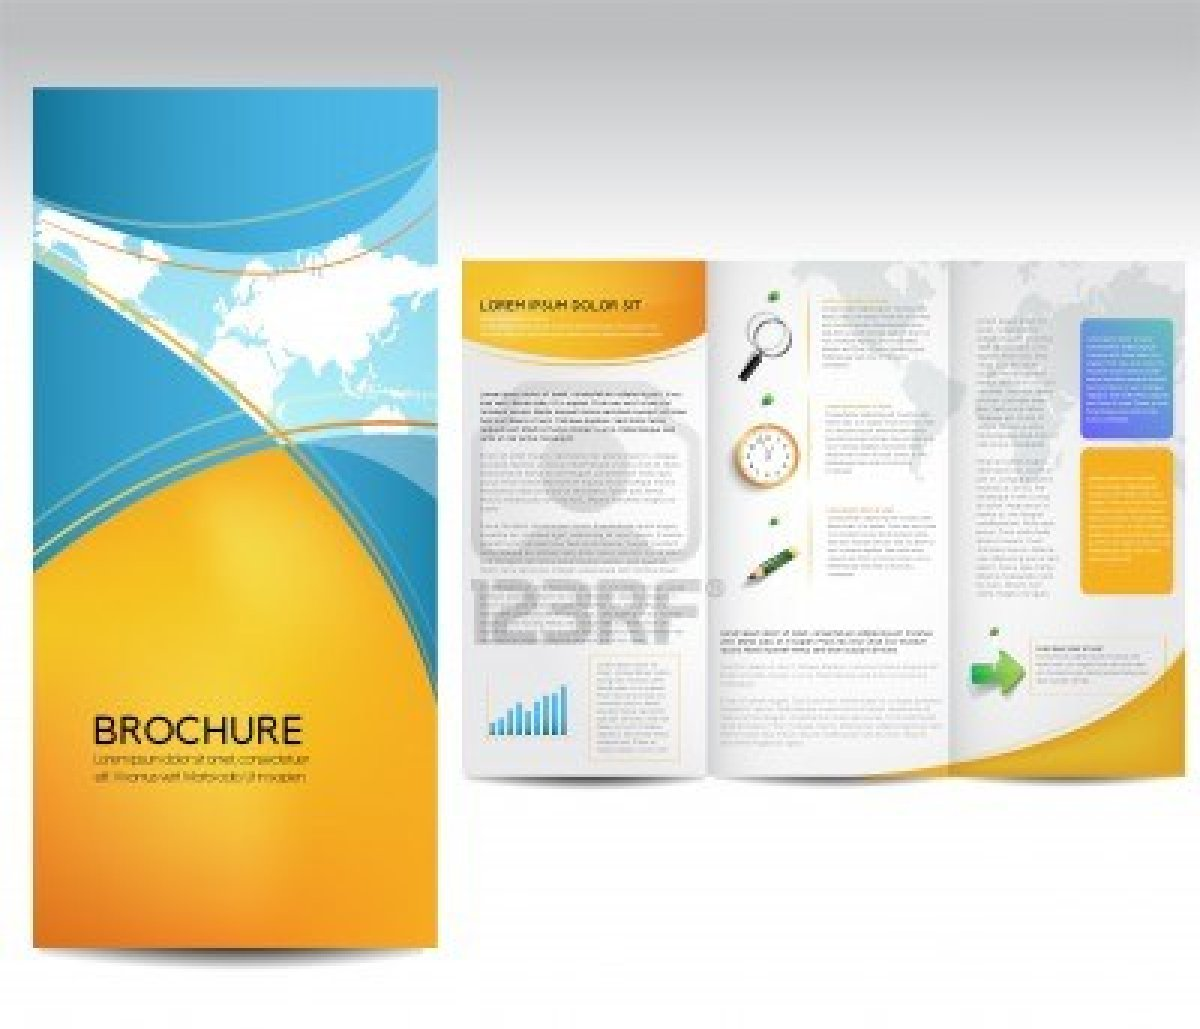 Brochure Design Templates Free Download